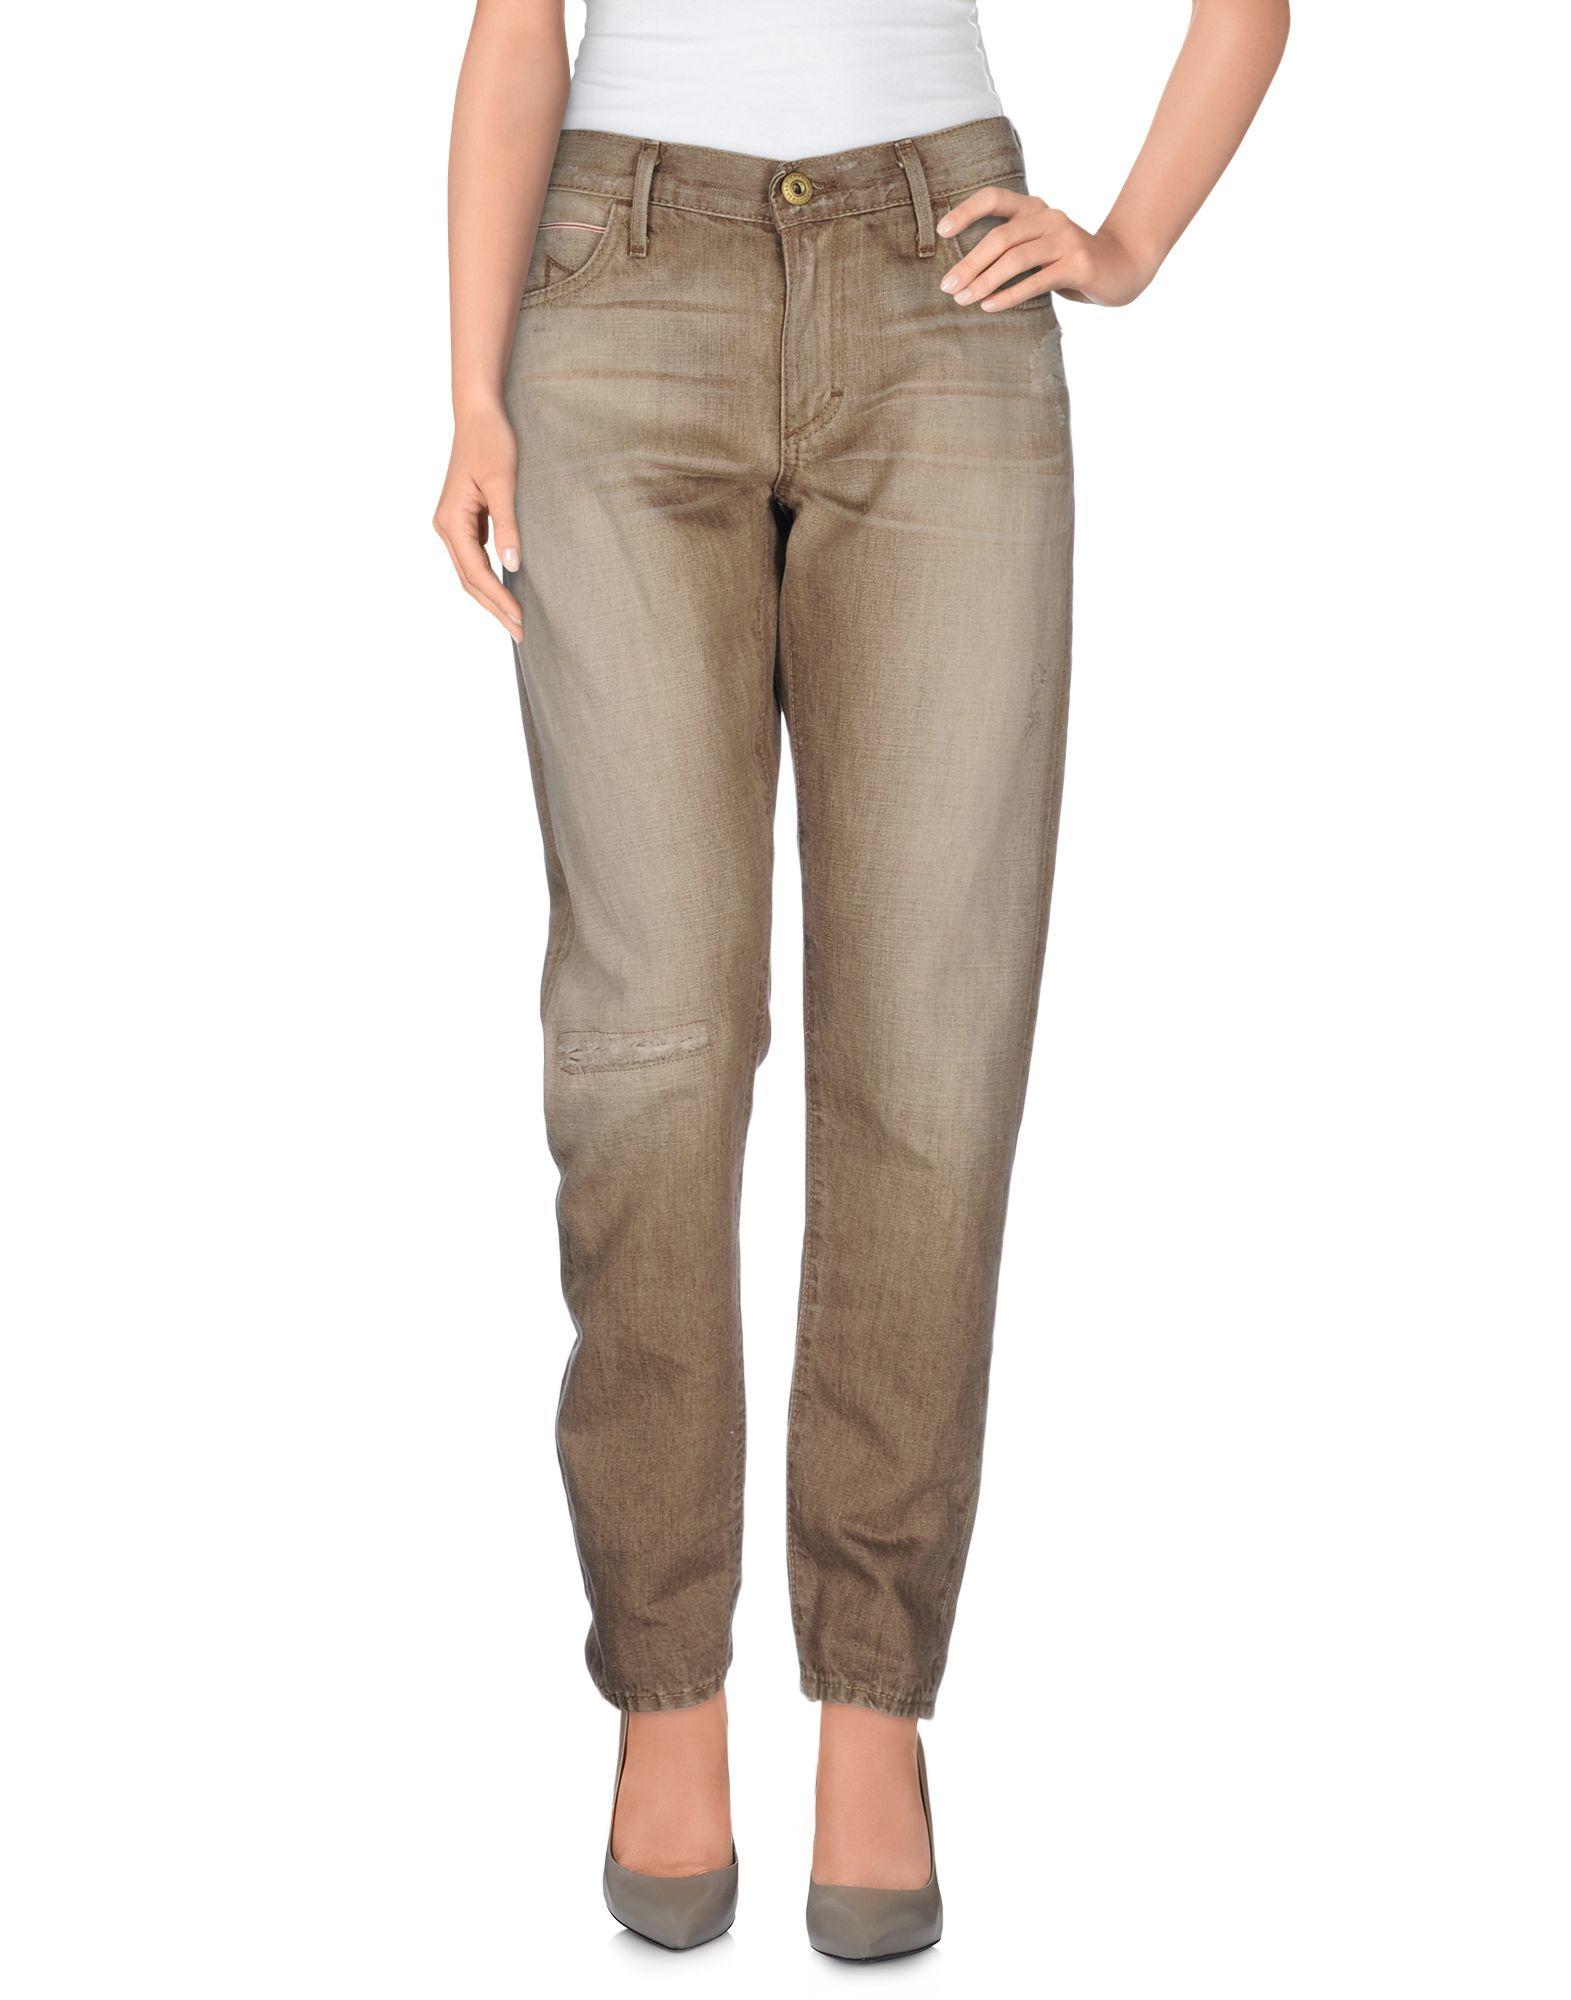 Natural Colored Linen Pants